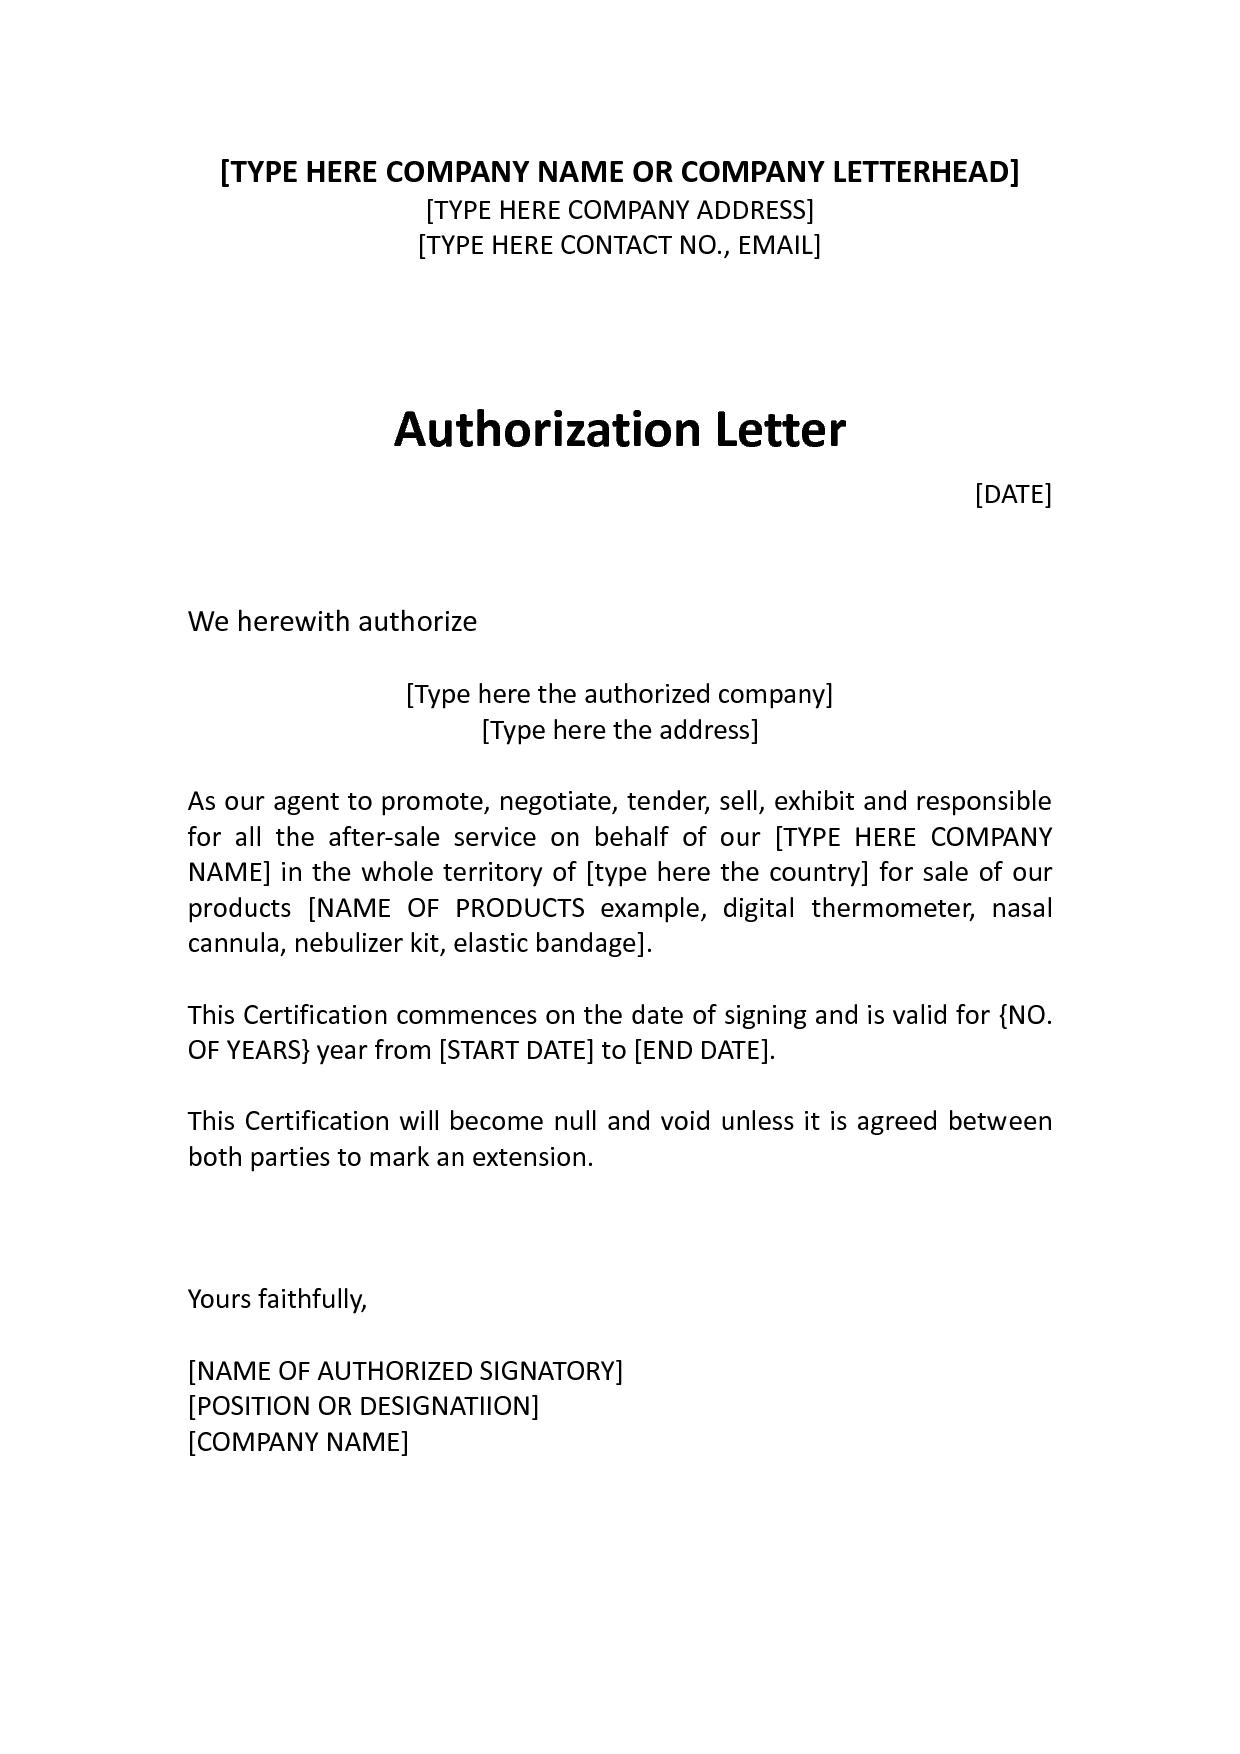 Parental Consent Permission Letter Template - Authorization Distributor Letter Sample Distributor Dealer